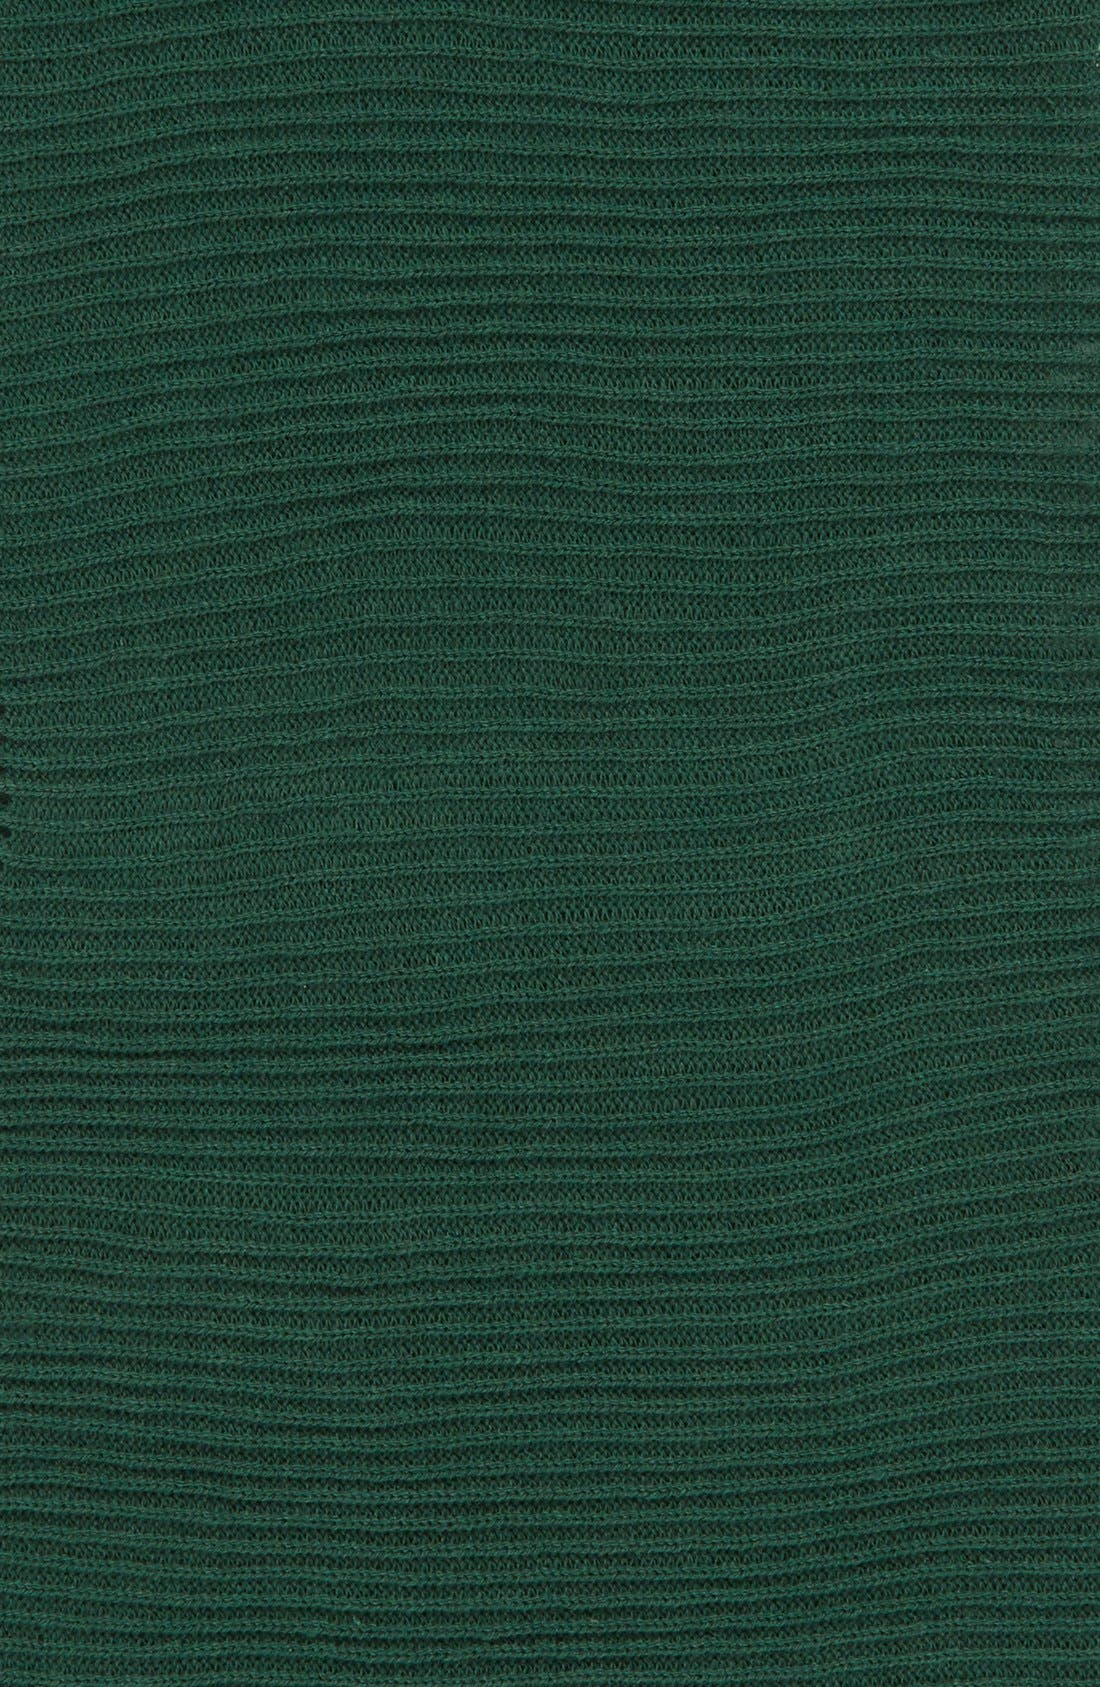 Rib Knit Fringe Infinity Scarf,                             Alternate thumbnail 10, color,